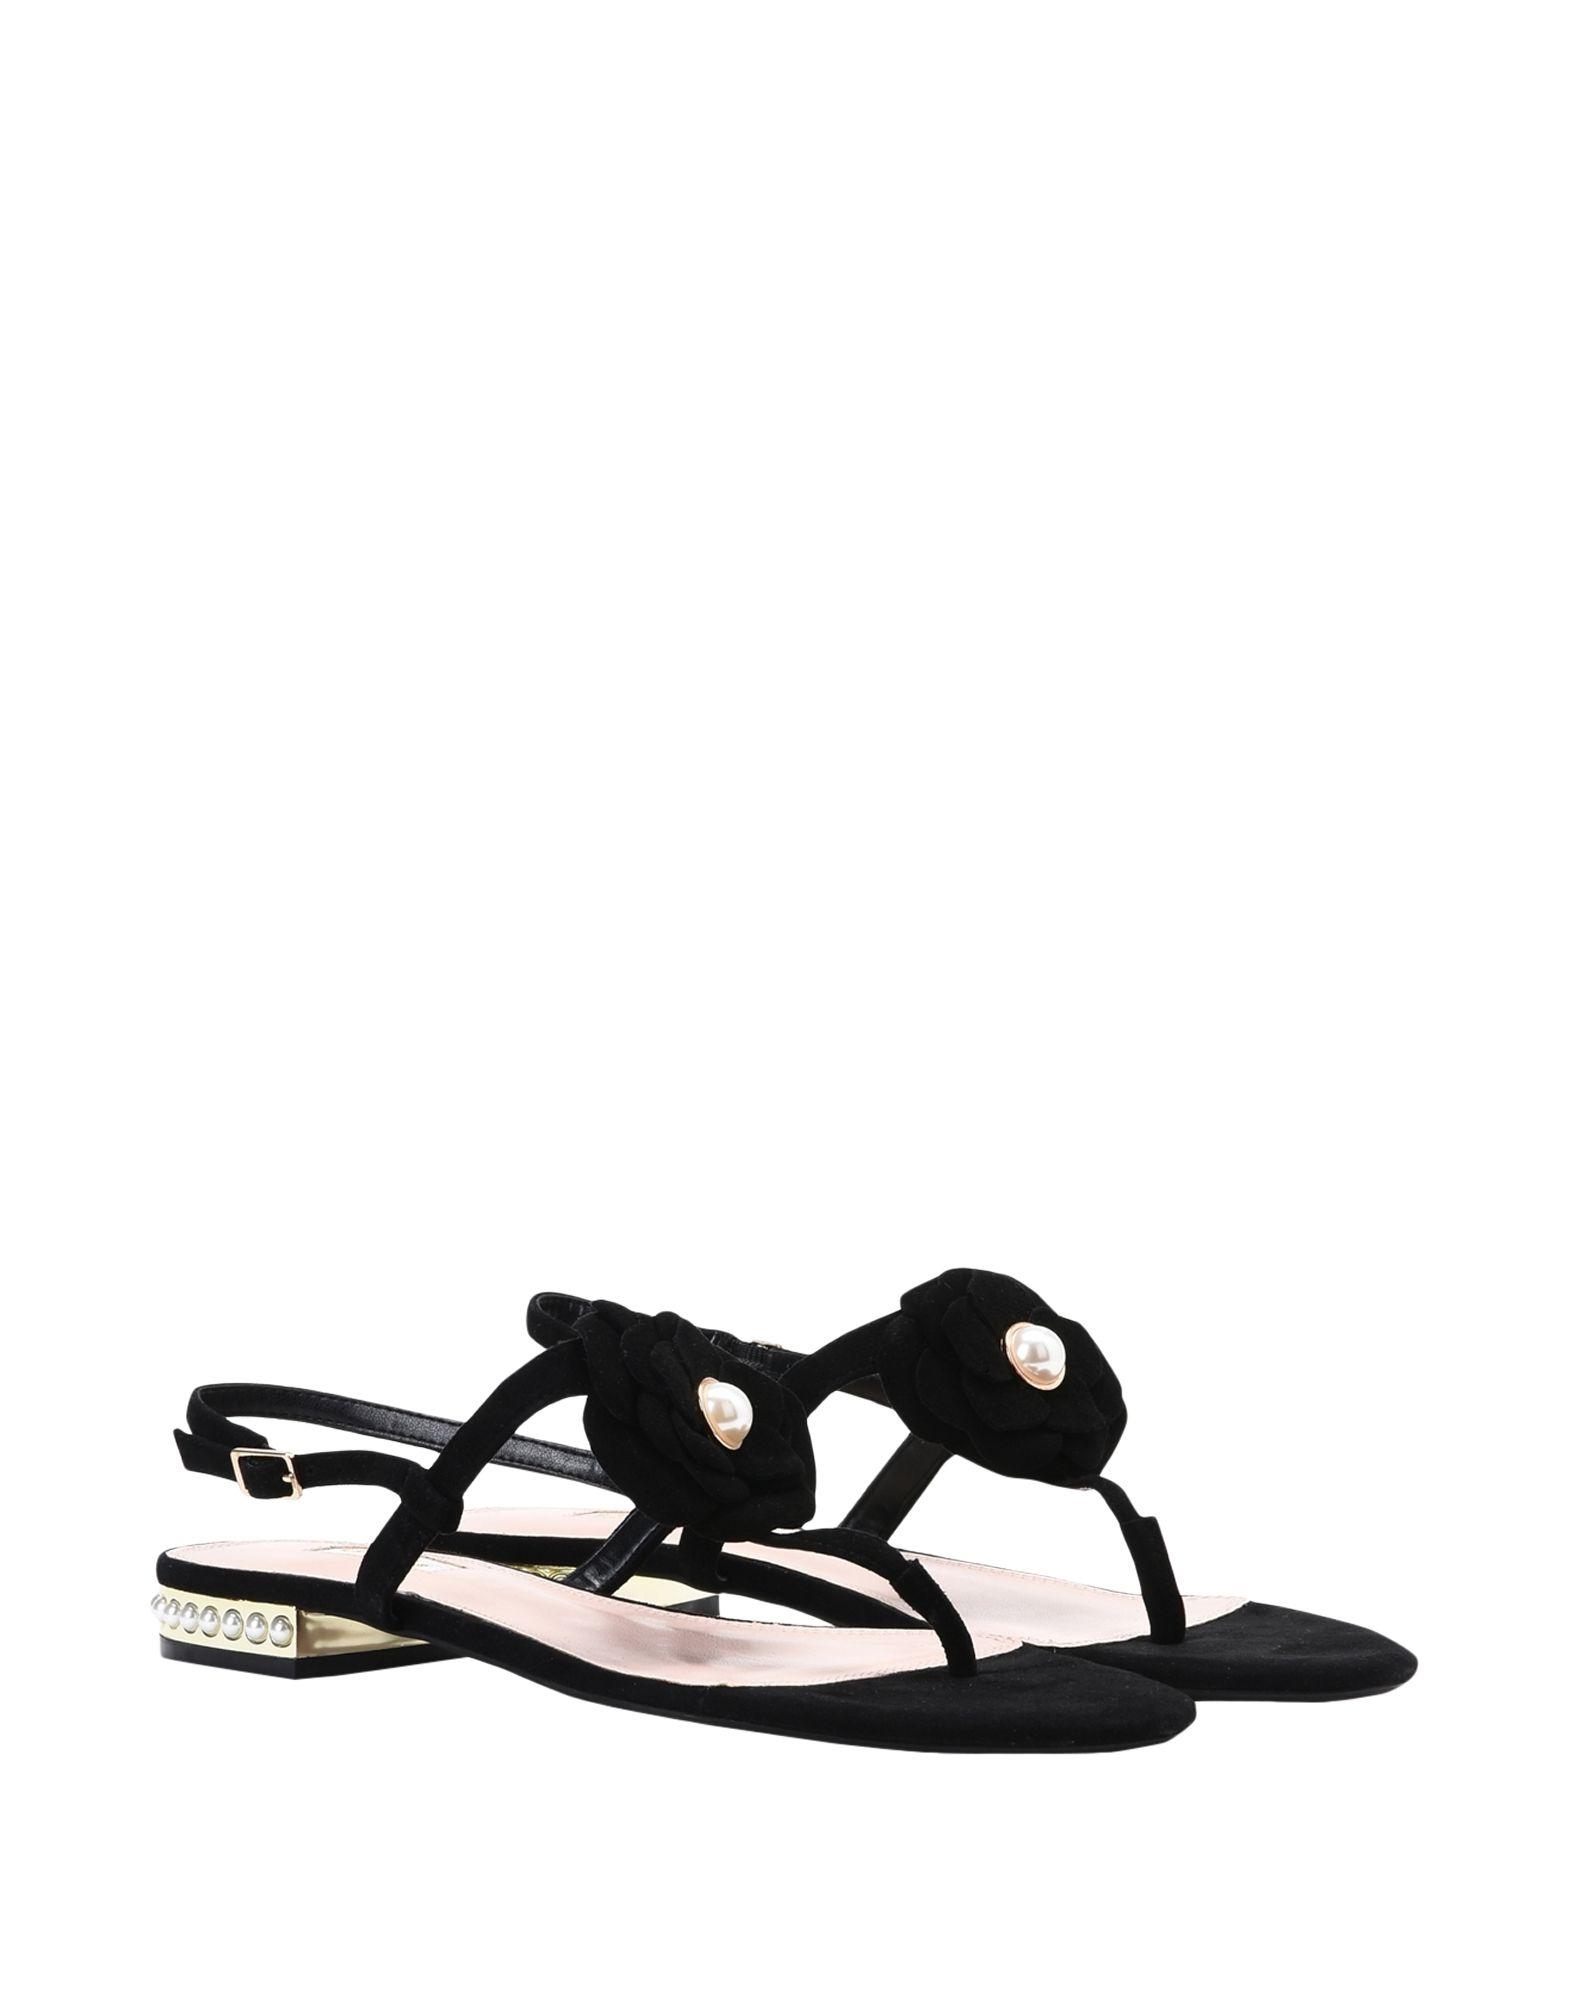 Dune London Toe 11441907UL Thong Flower Sandal  11441907UL Toe Gute Qualität beliebte Schuhe 2bb7f9